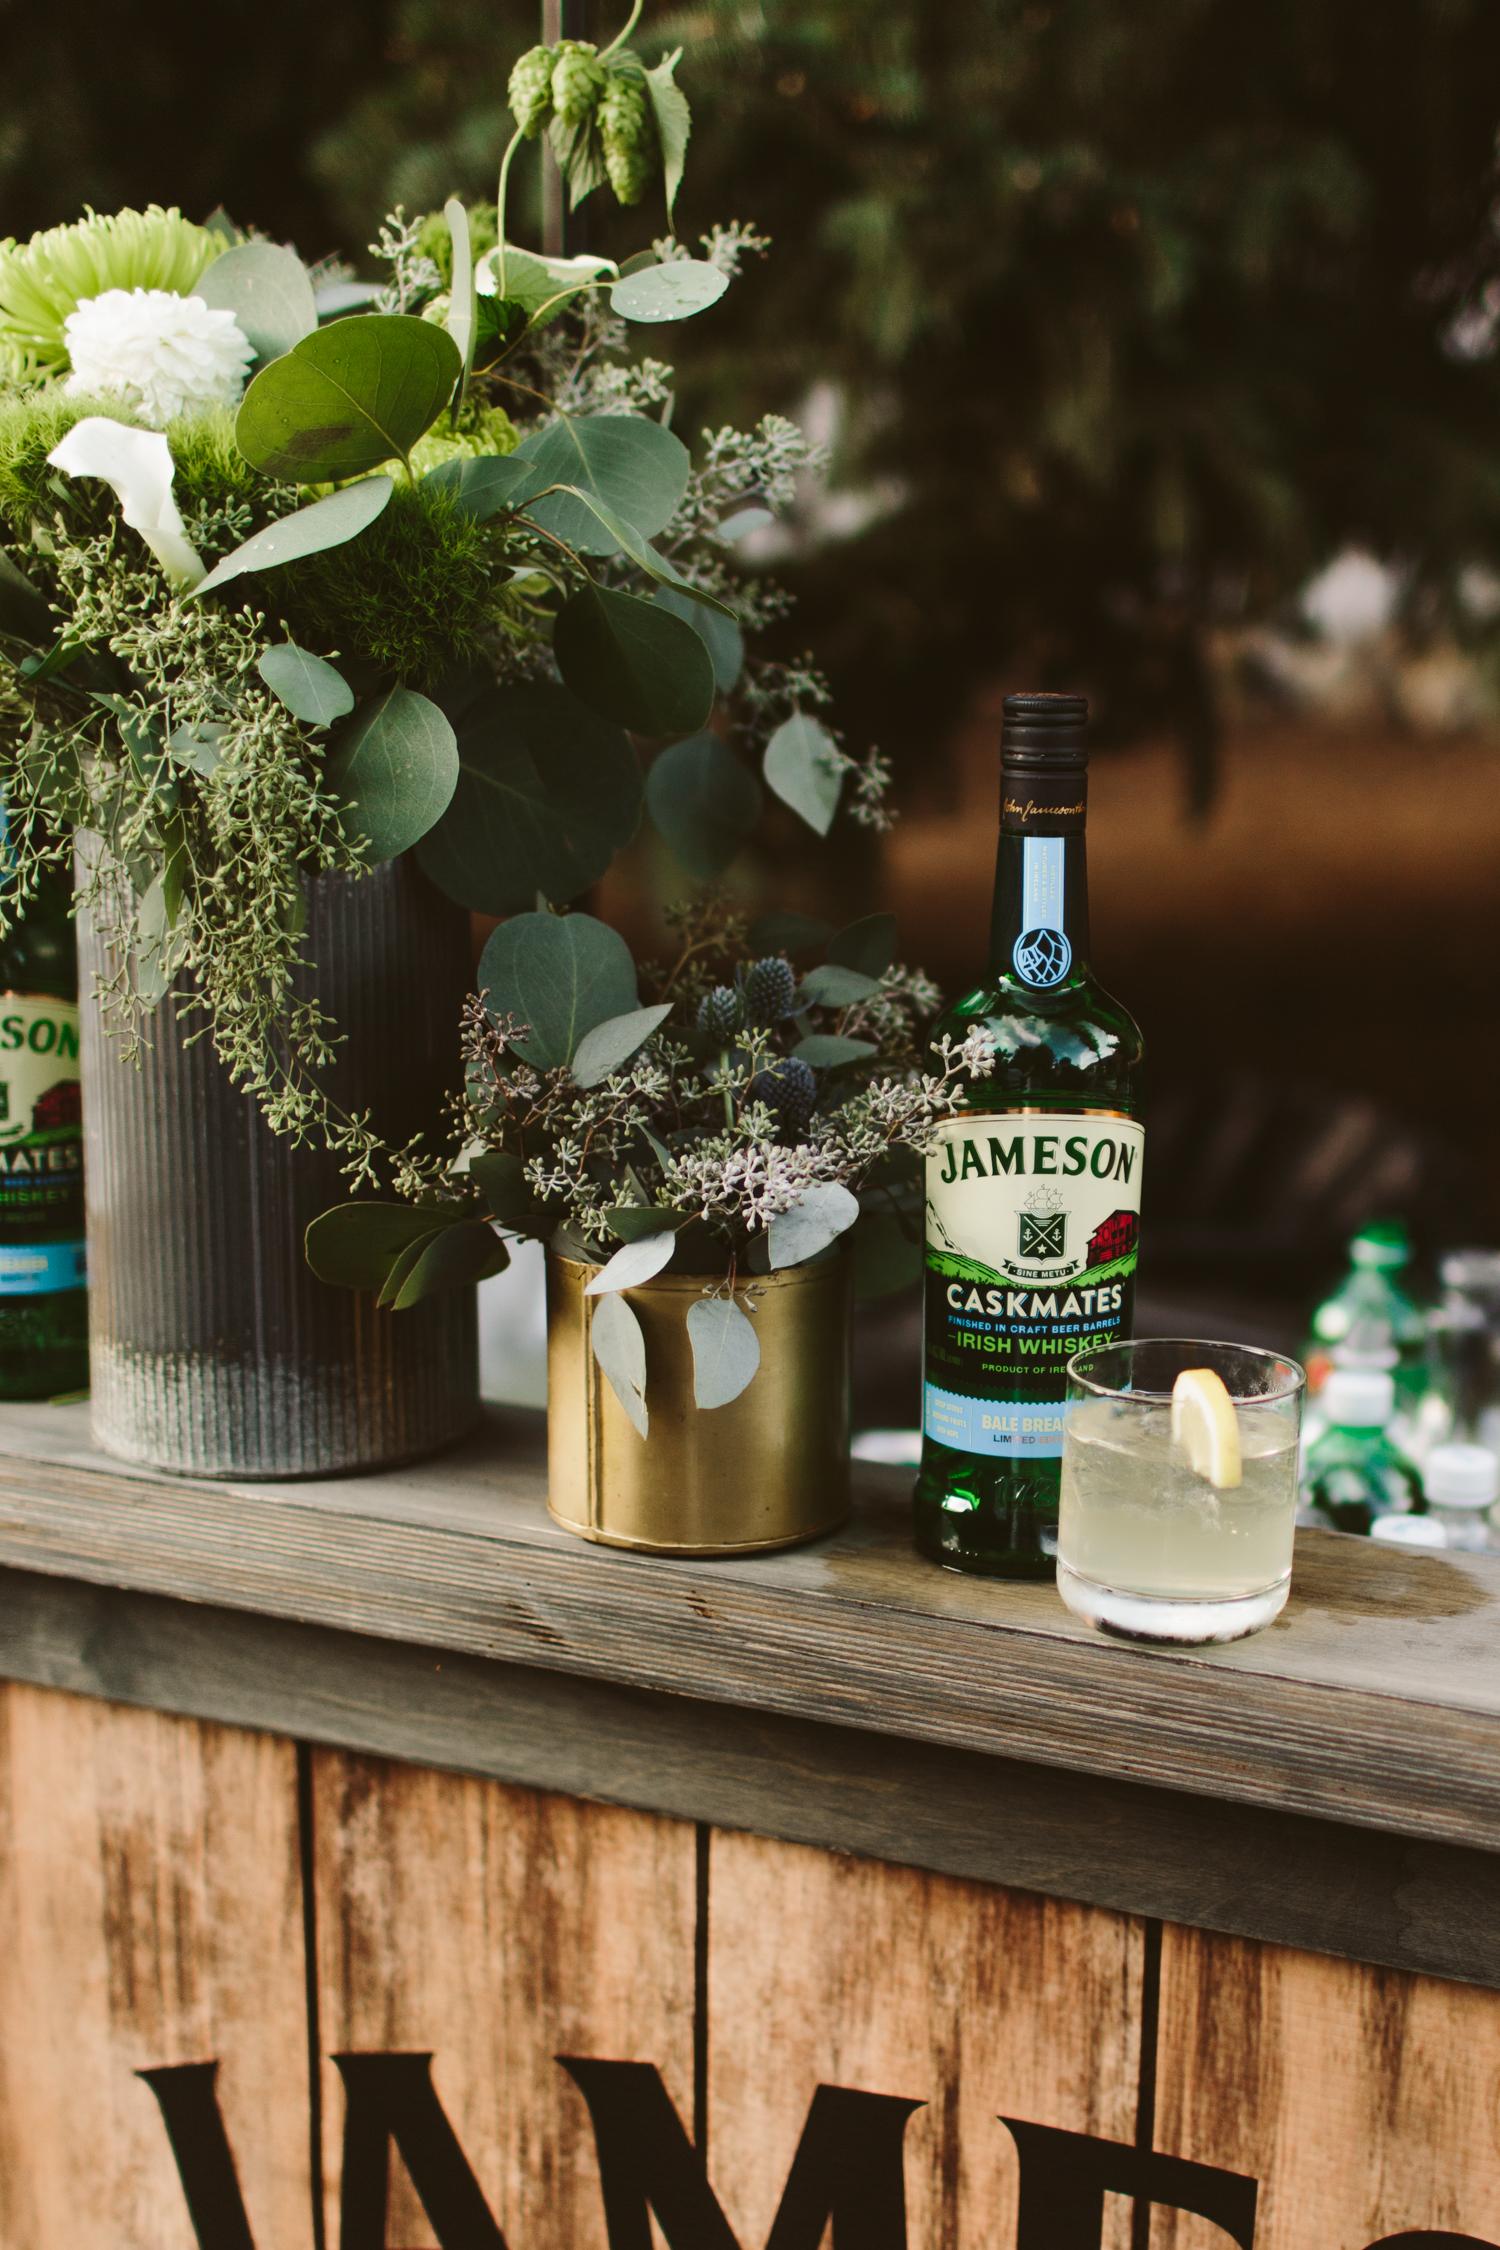 Jameson Topcutter IPA Caskmates-8.jpg